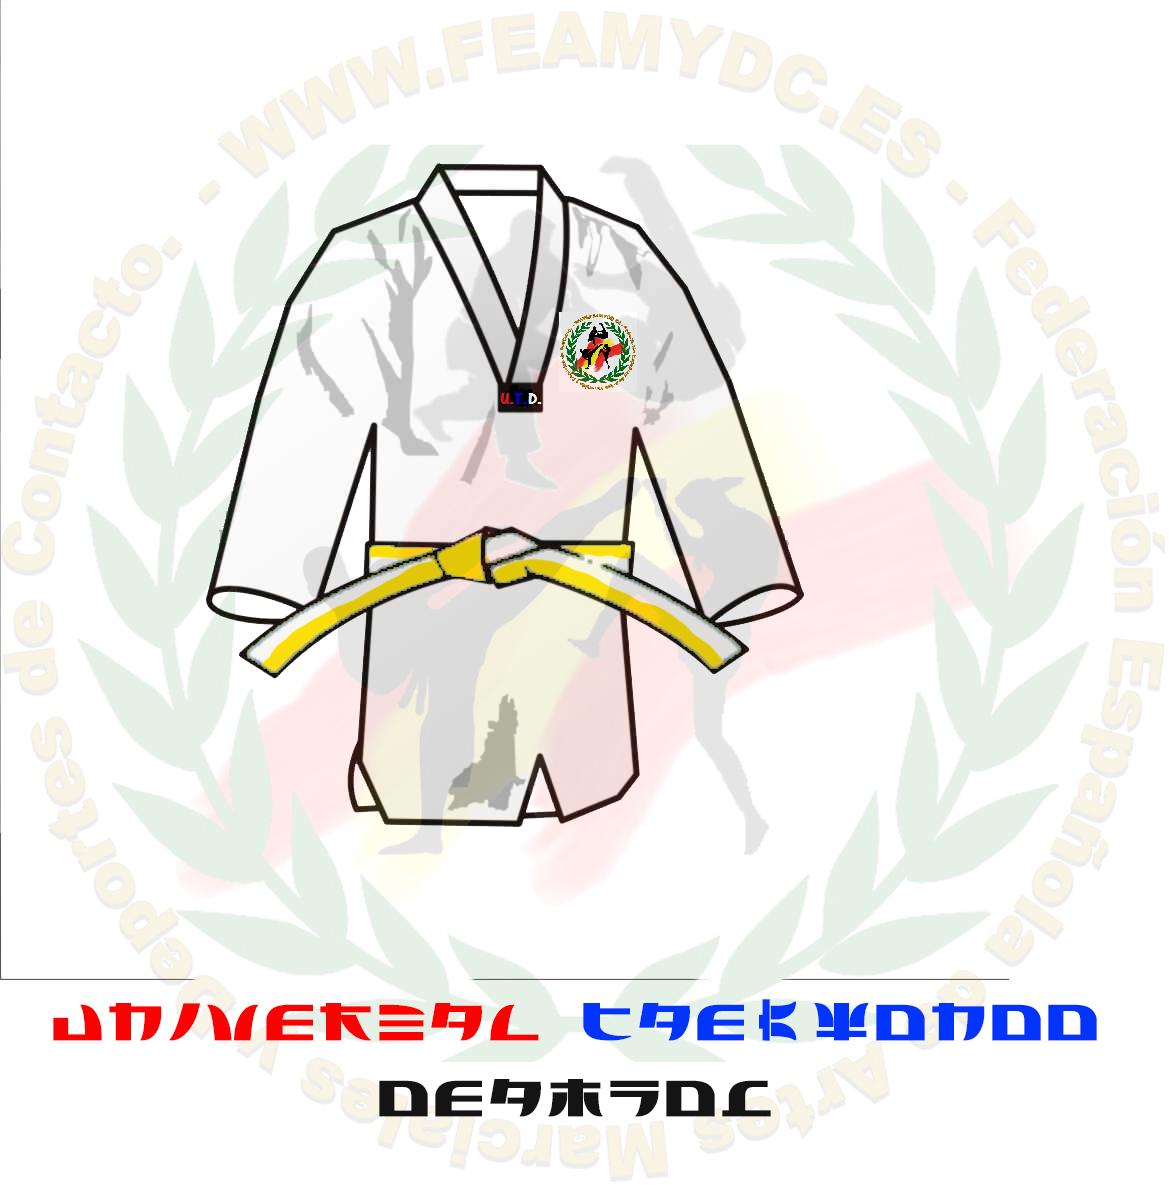 Grados y cinturones Universal Taekwon-do DEAMYDC (U.T.D. ...